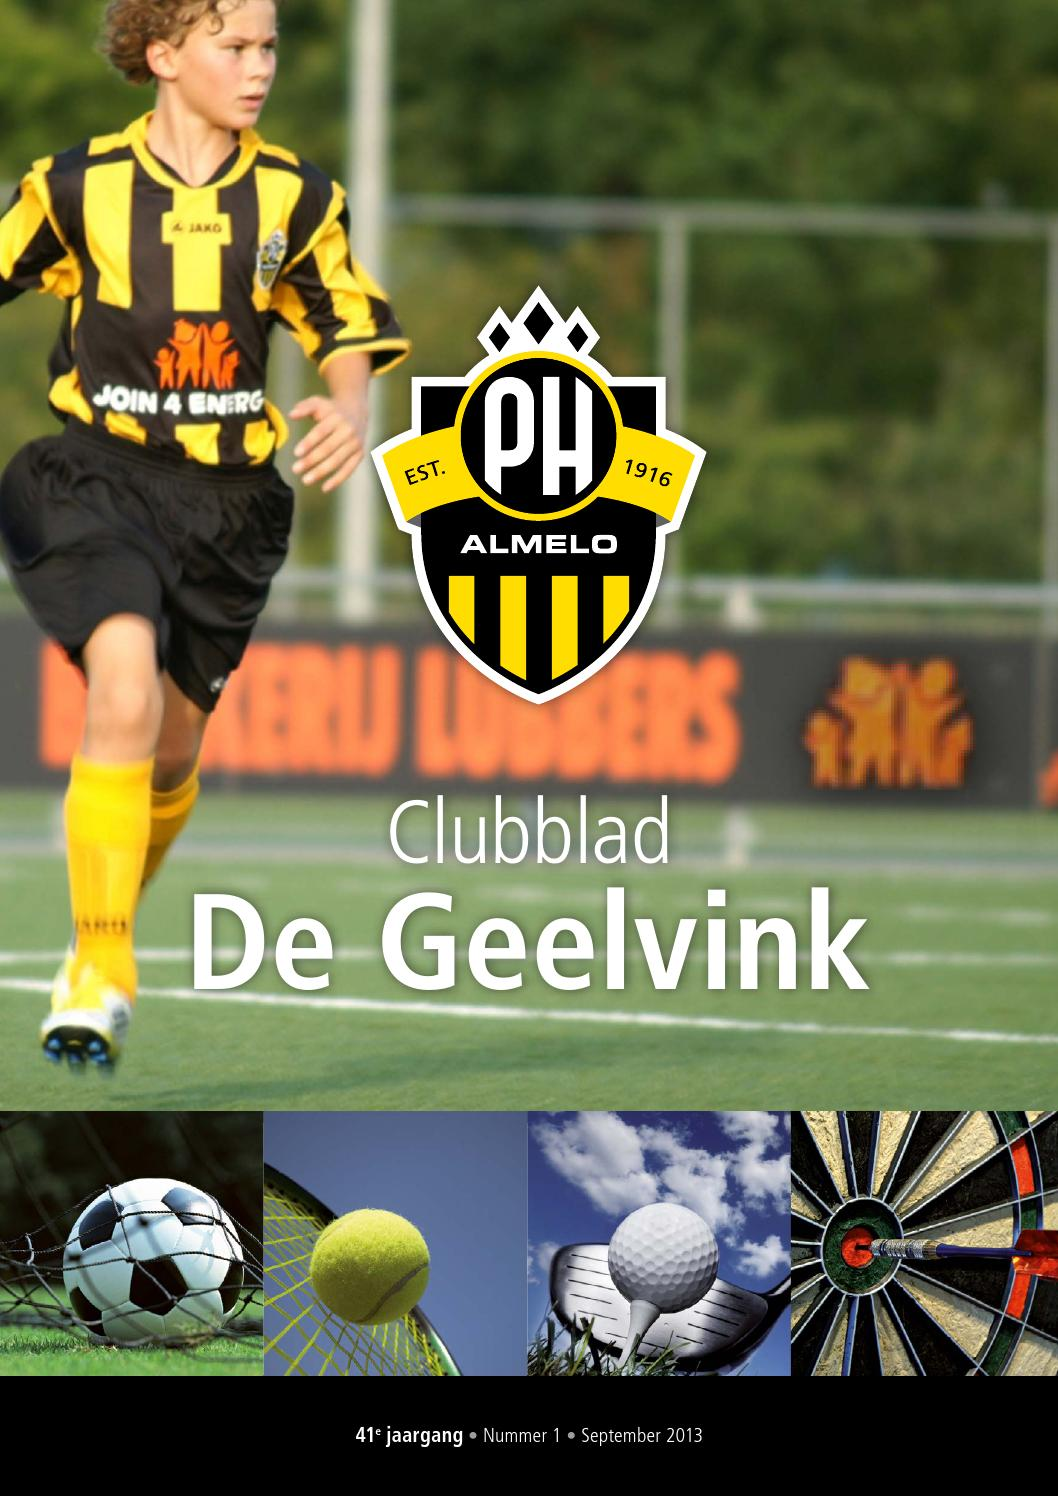 PH De Geelvink Nr-1 2013-2014 by Lulof - Arjan Kole - issuu